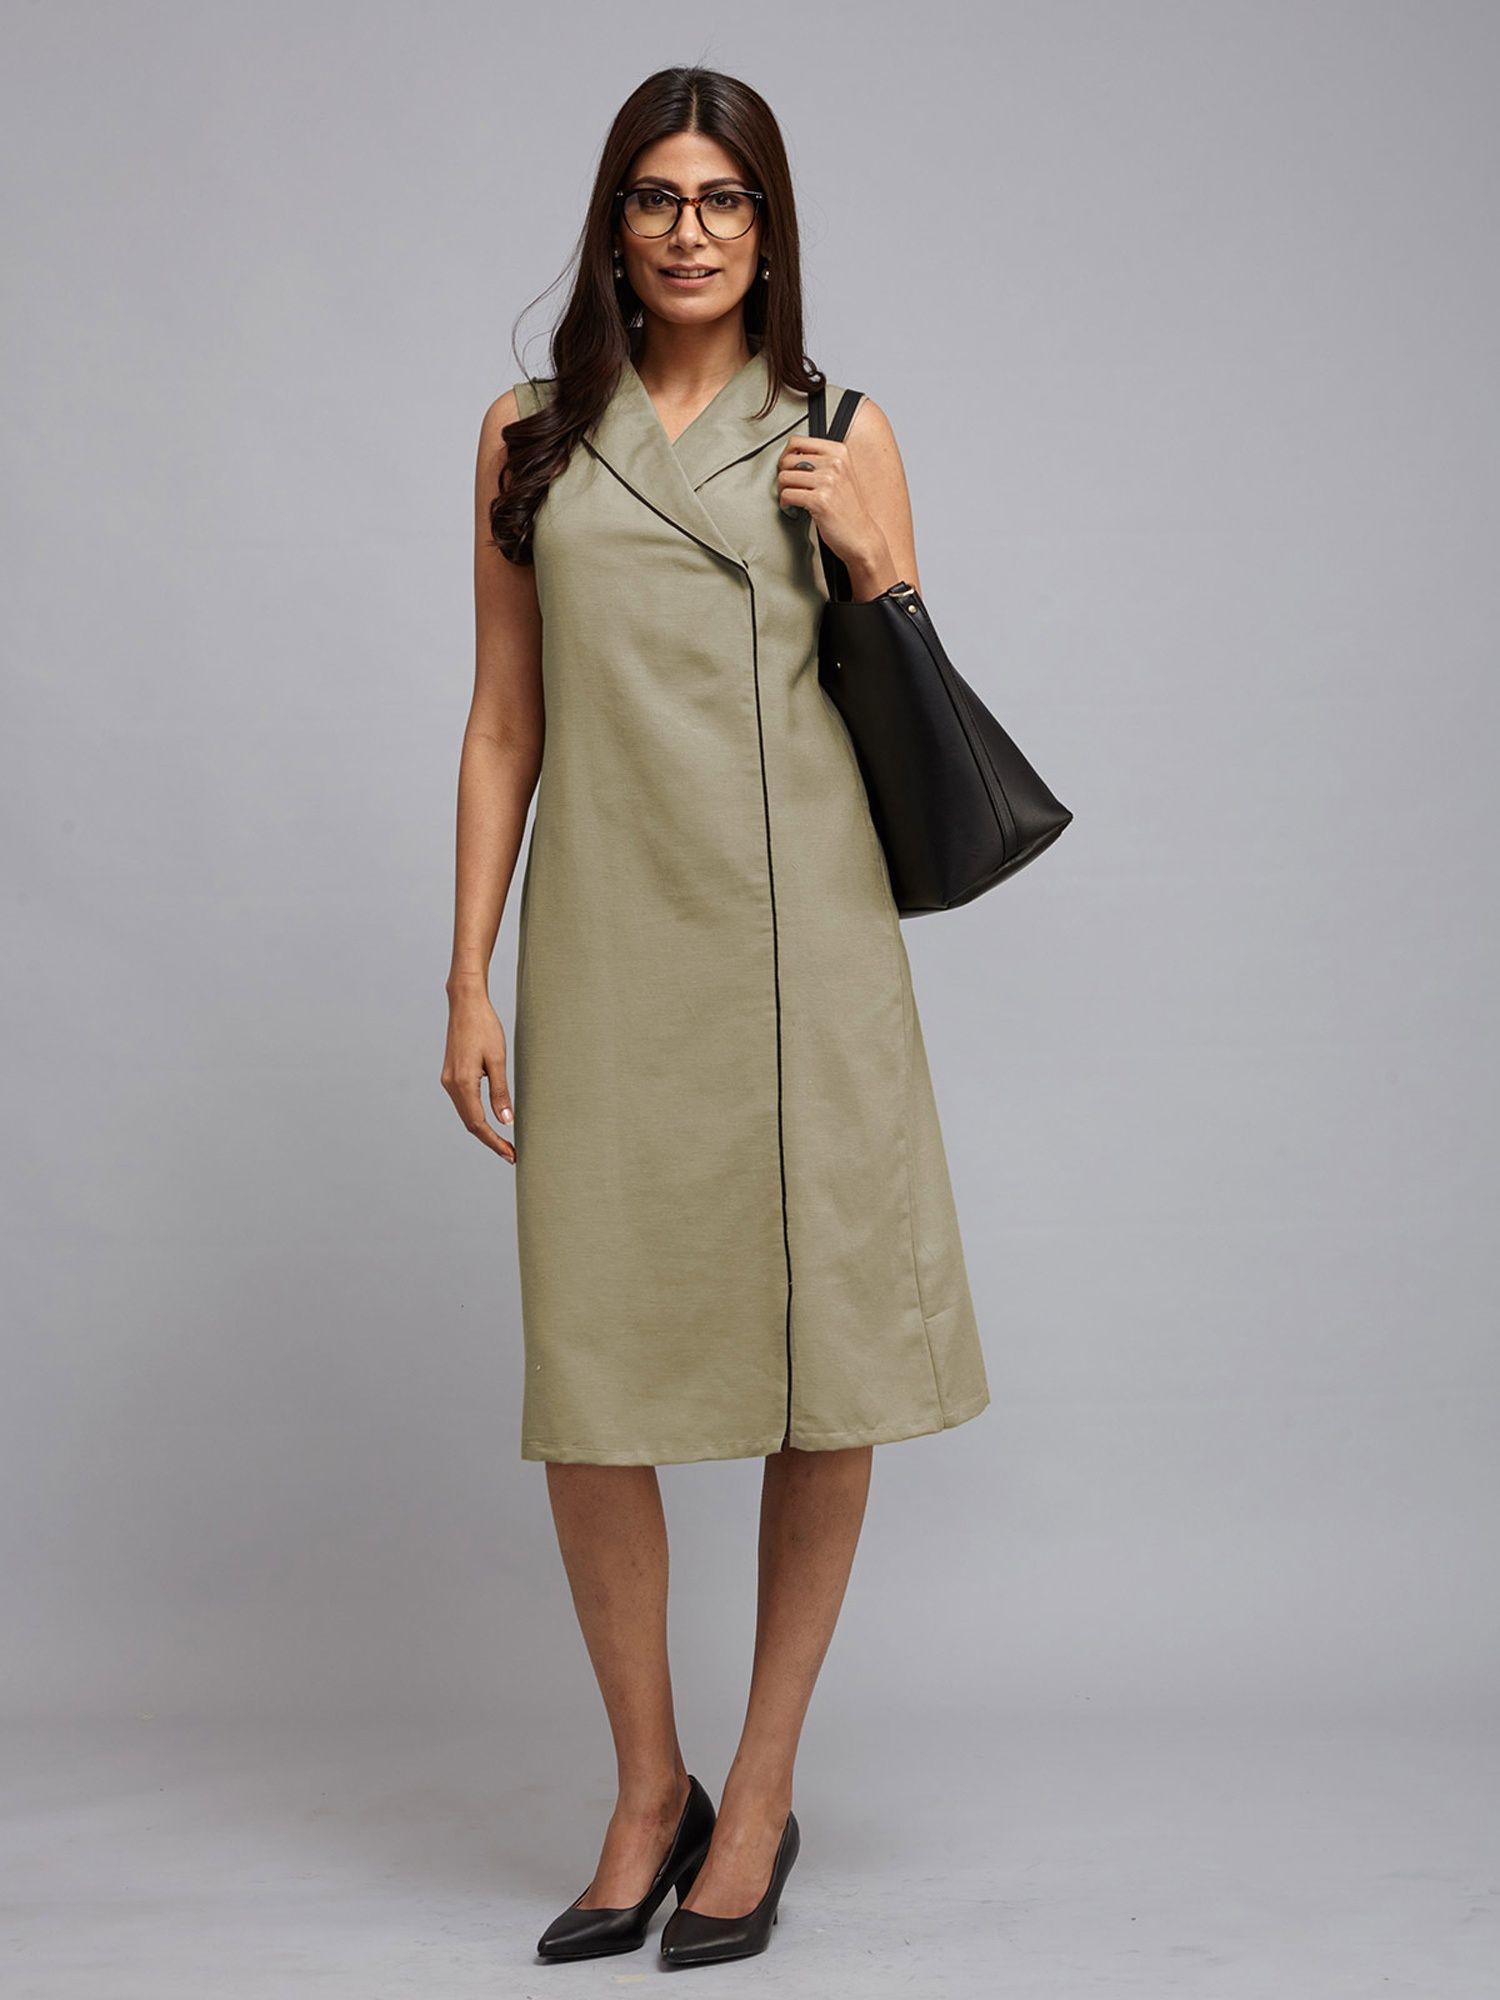 0412529b2b FableStreet Dresses   Buy FableStreet Collared Midi Dress - Olive Online